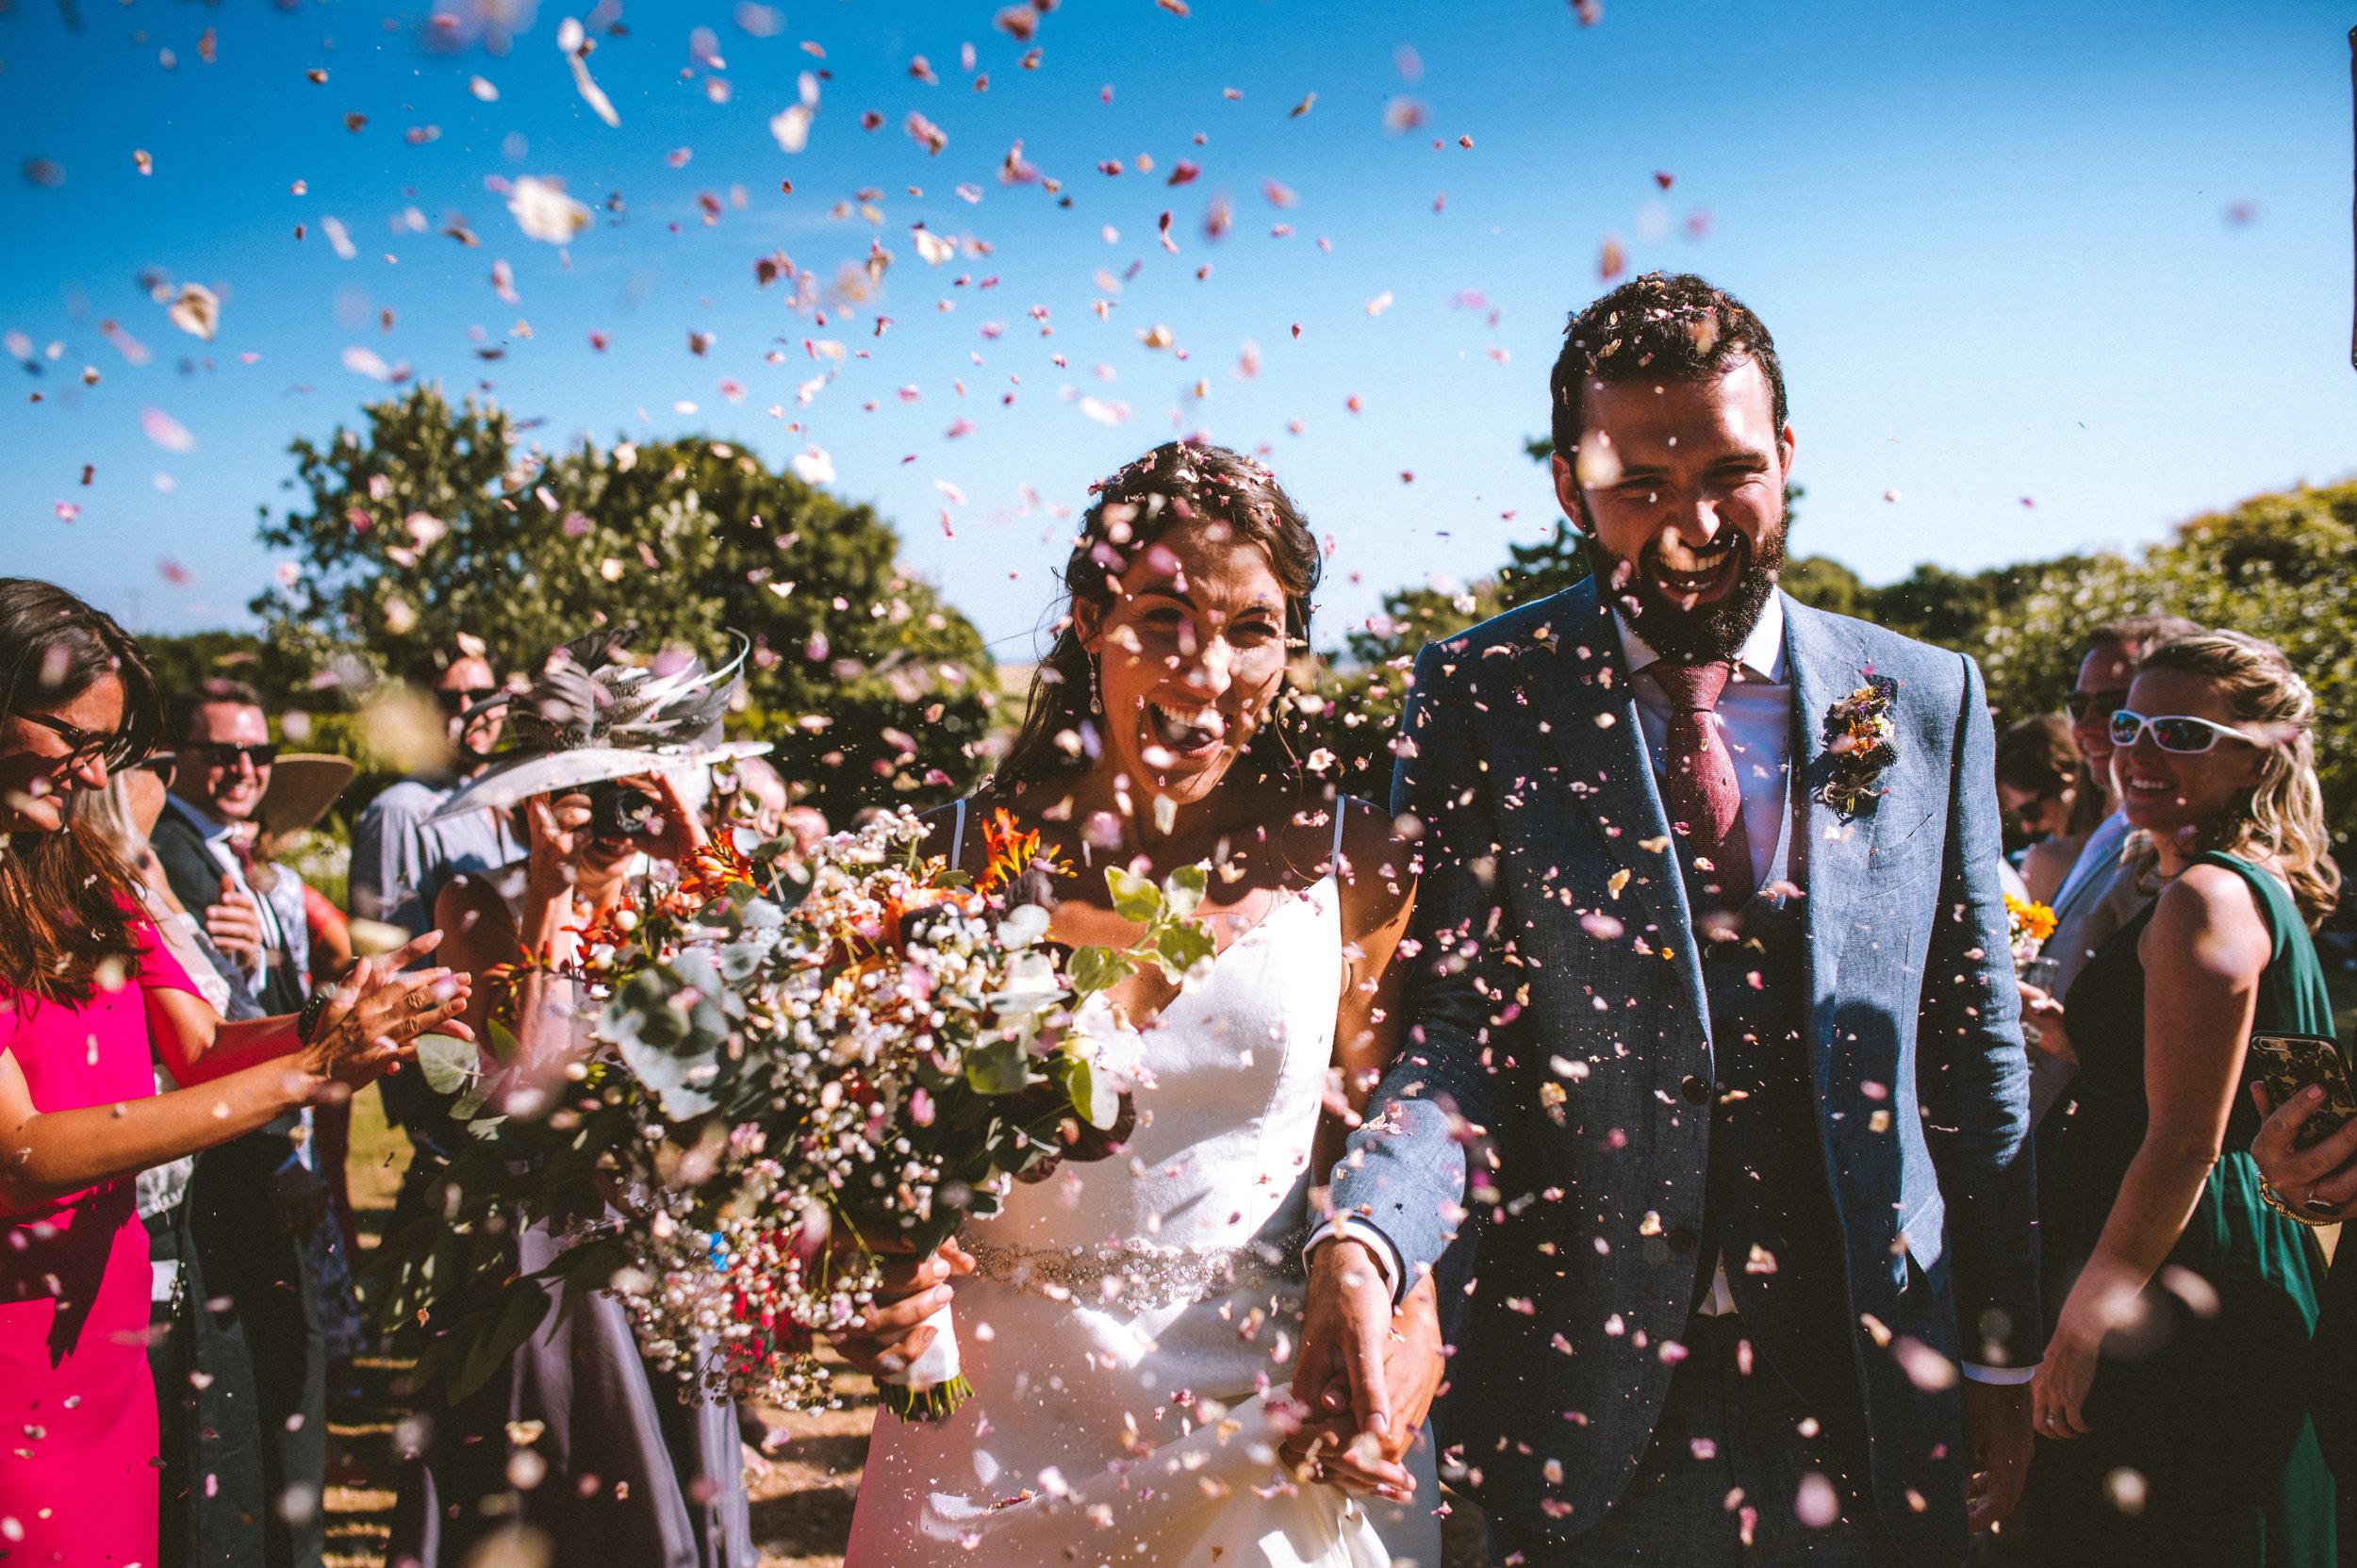 ashbarton-estate-wedding-photographer-mark-shaw-41.jpg